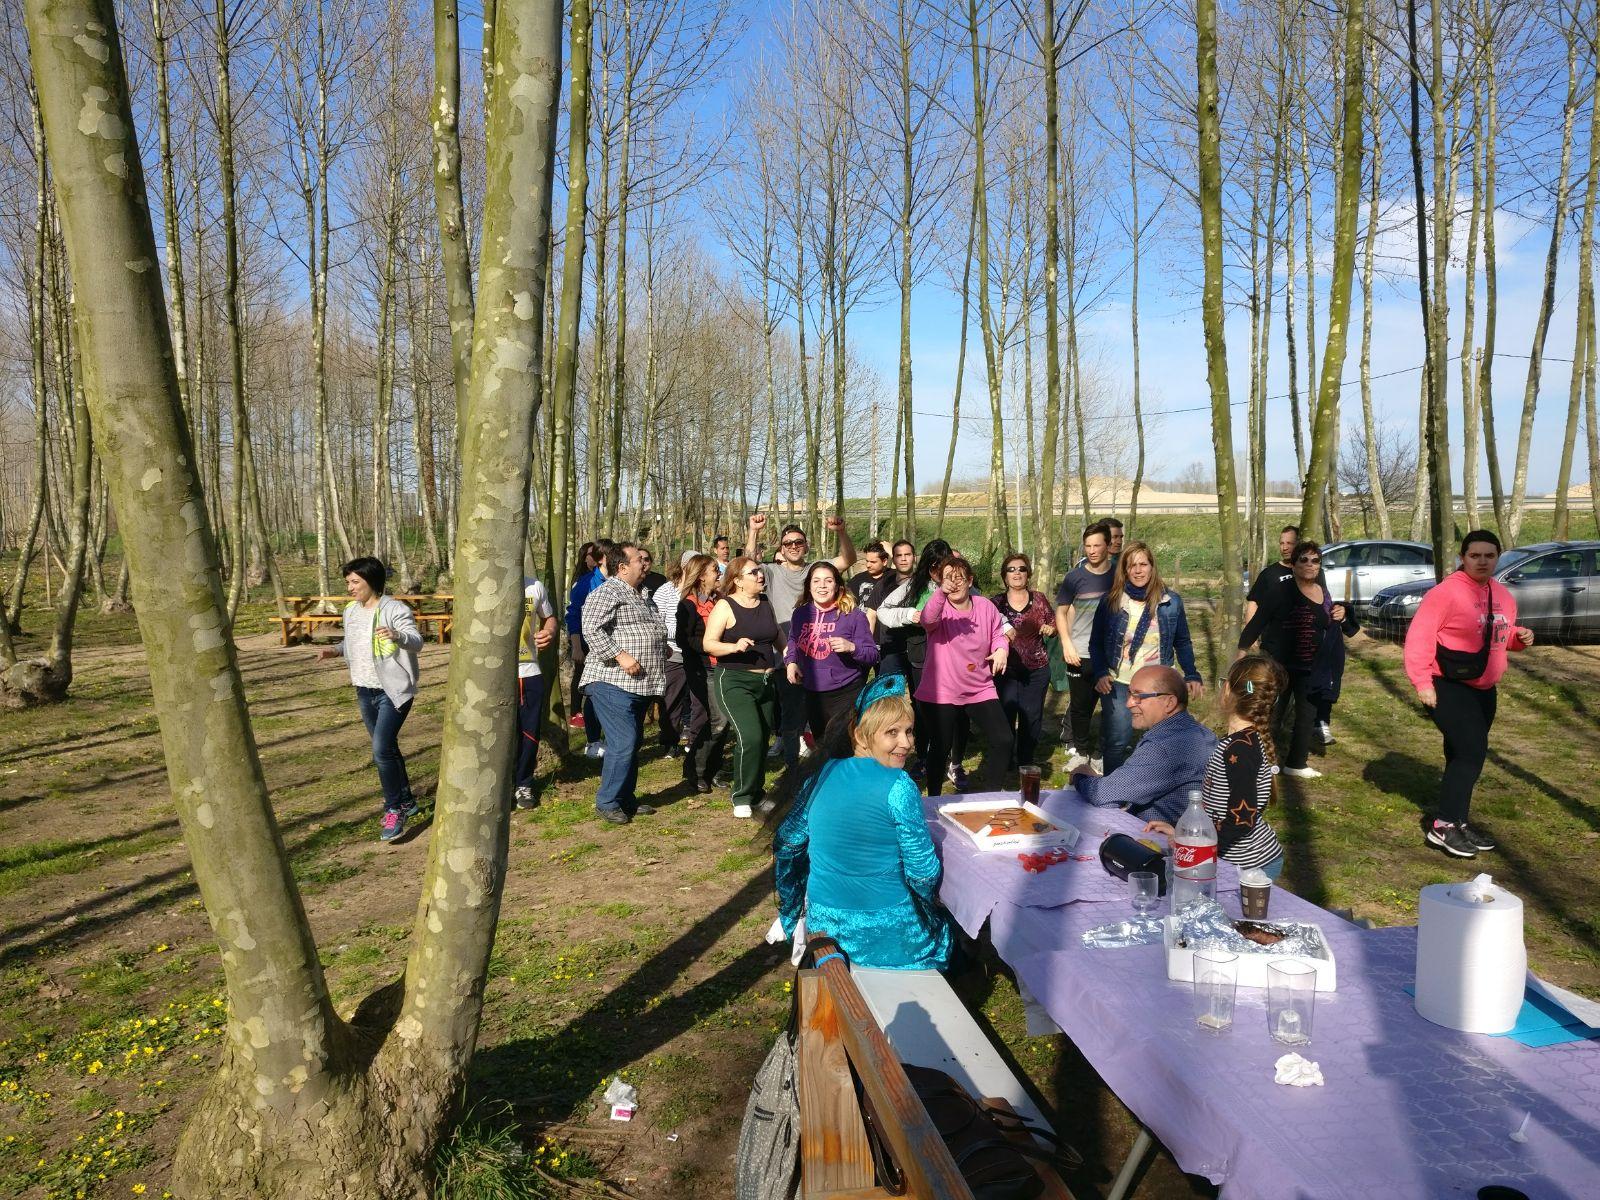 grup de celebracio a la taula picnic les 3 flors